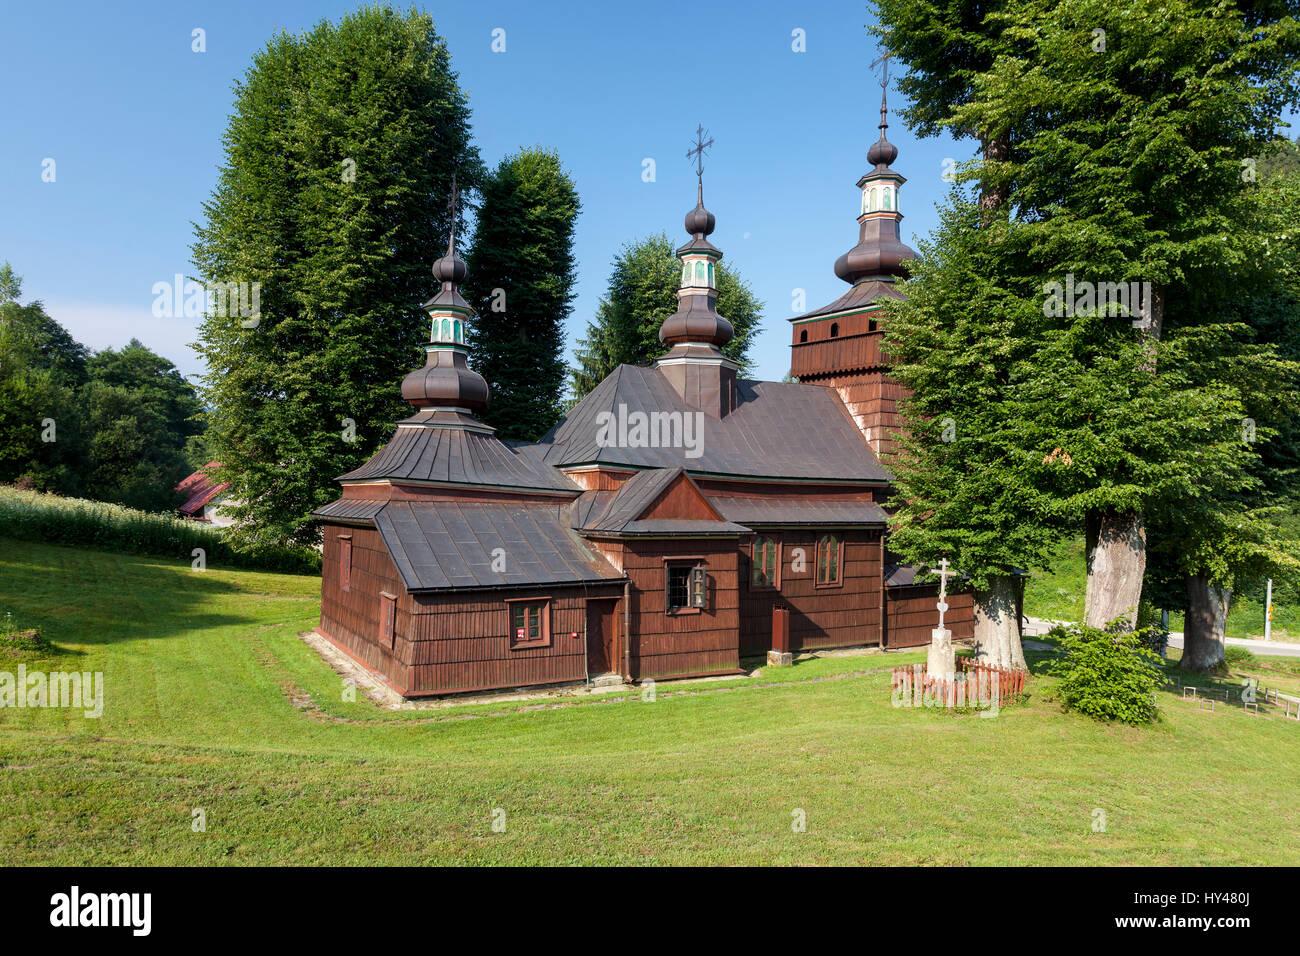 Milik, 19th century church, wooden architecture, Malopolska, Poland. - Stock Image